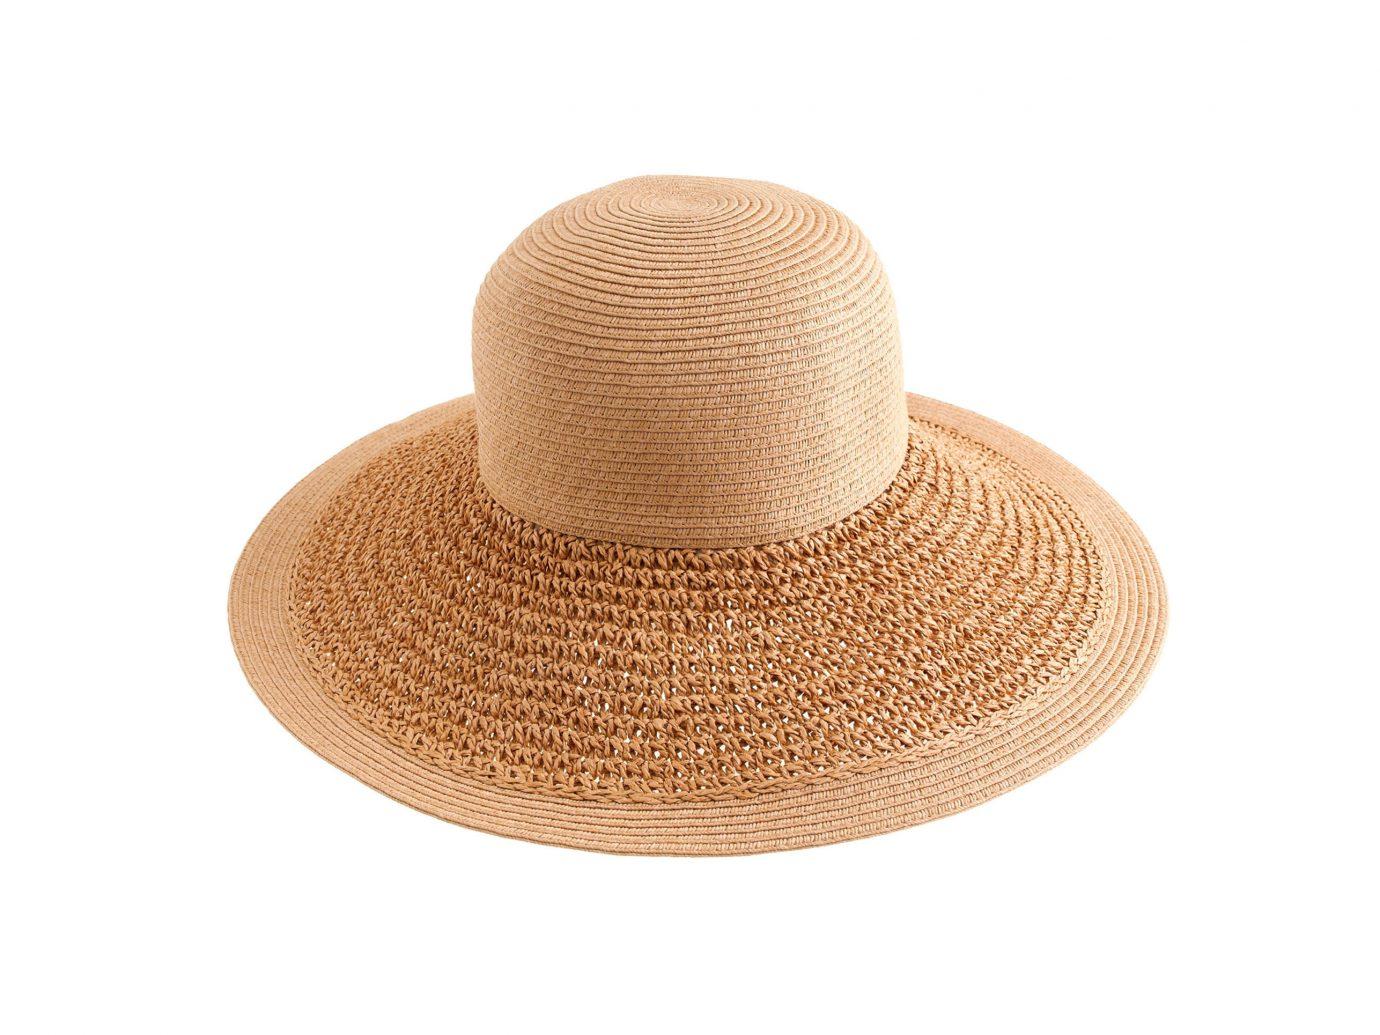 Style + Design clothing hat straw sun hat fashion accessory headdress fedora agriculture old cap headgear cowboy hat beige